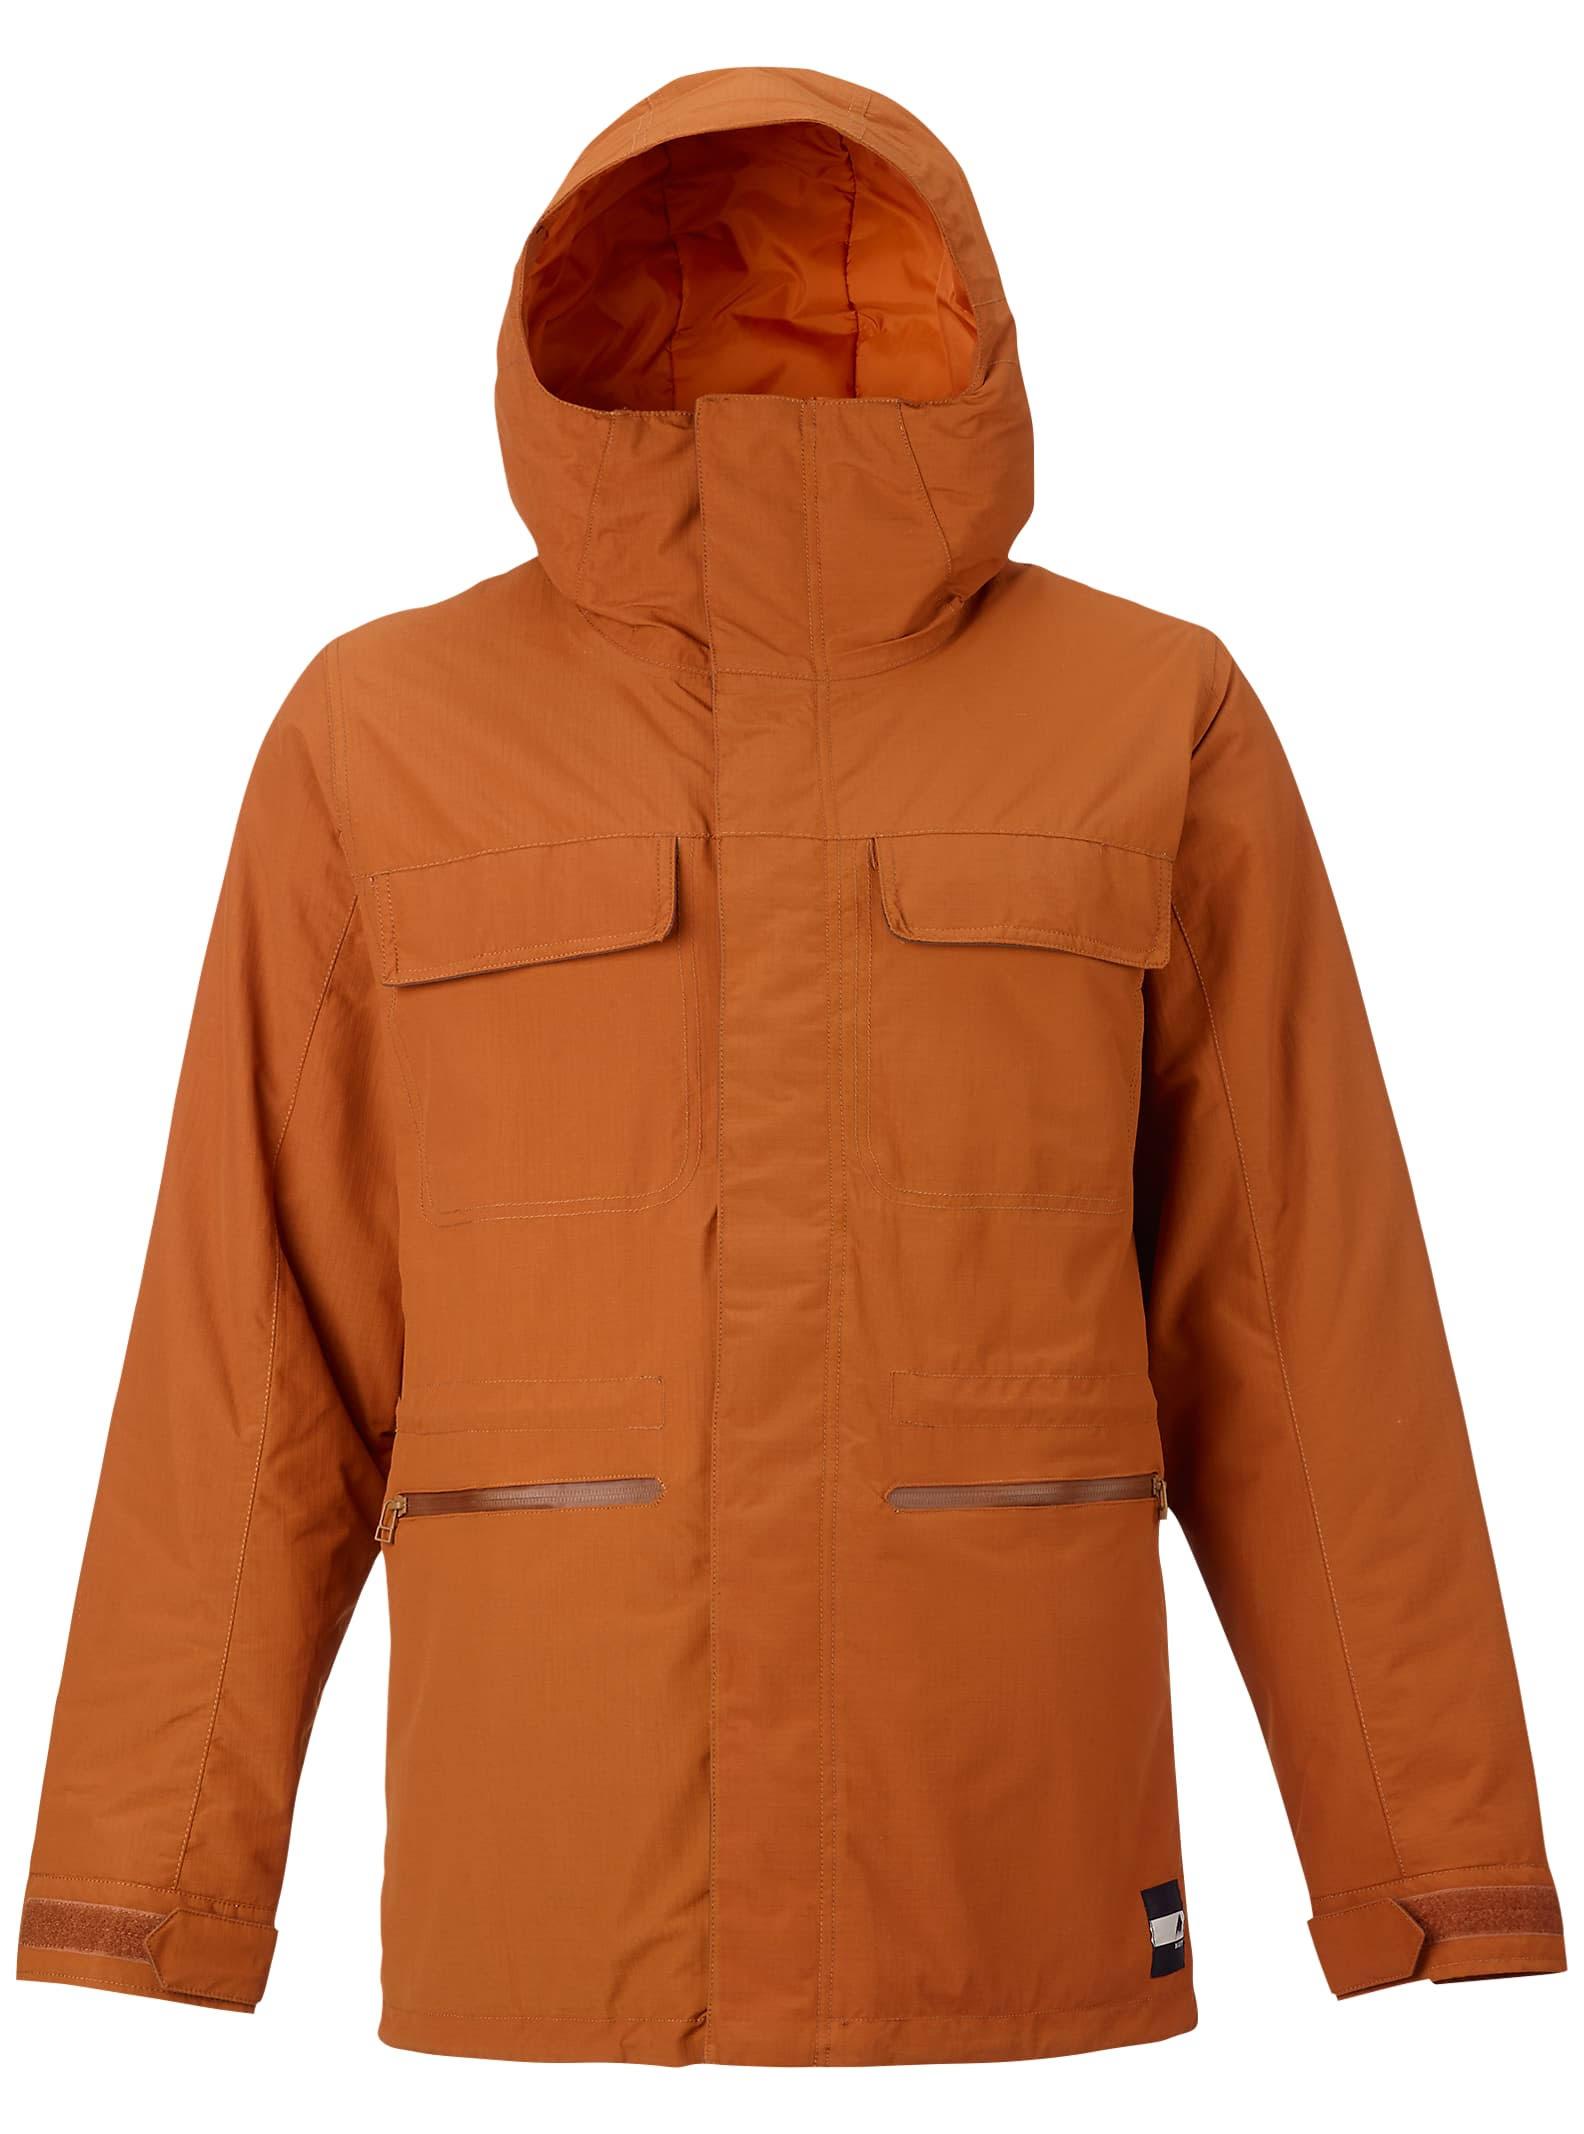 2017 Snowboard Large Burton Jacket True Encore Mens Penny wqxgxZzp